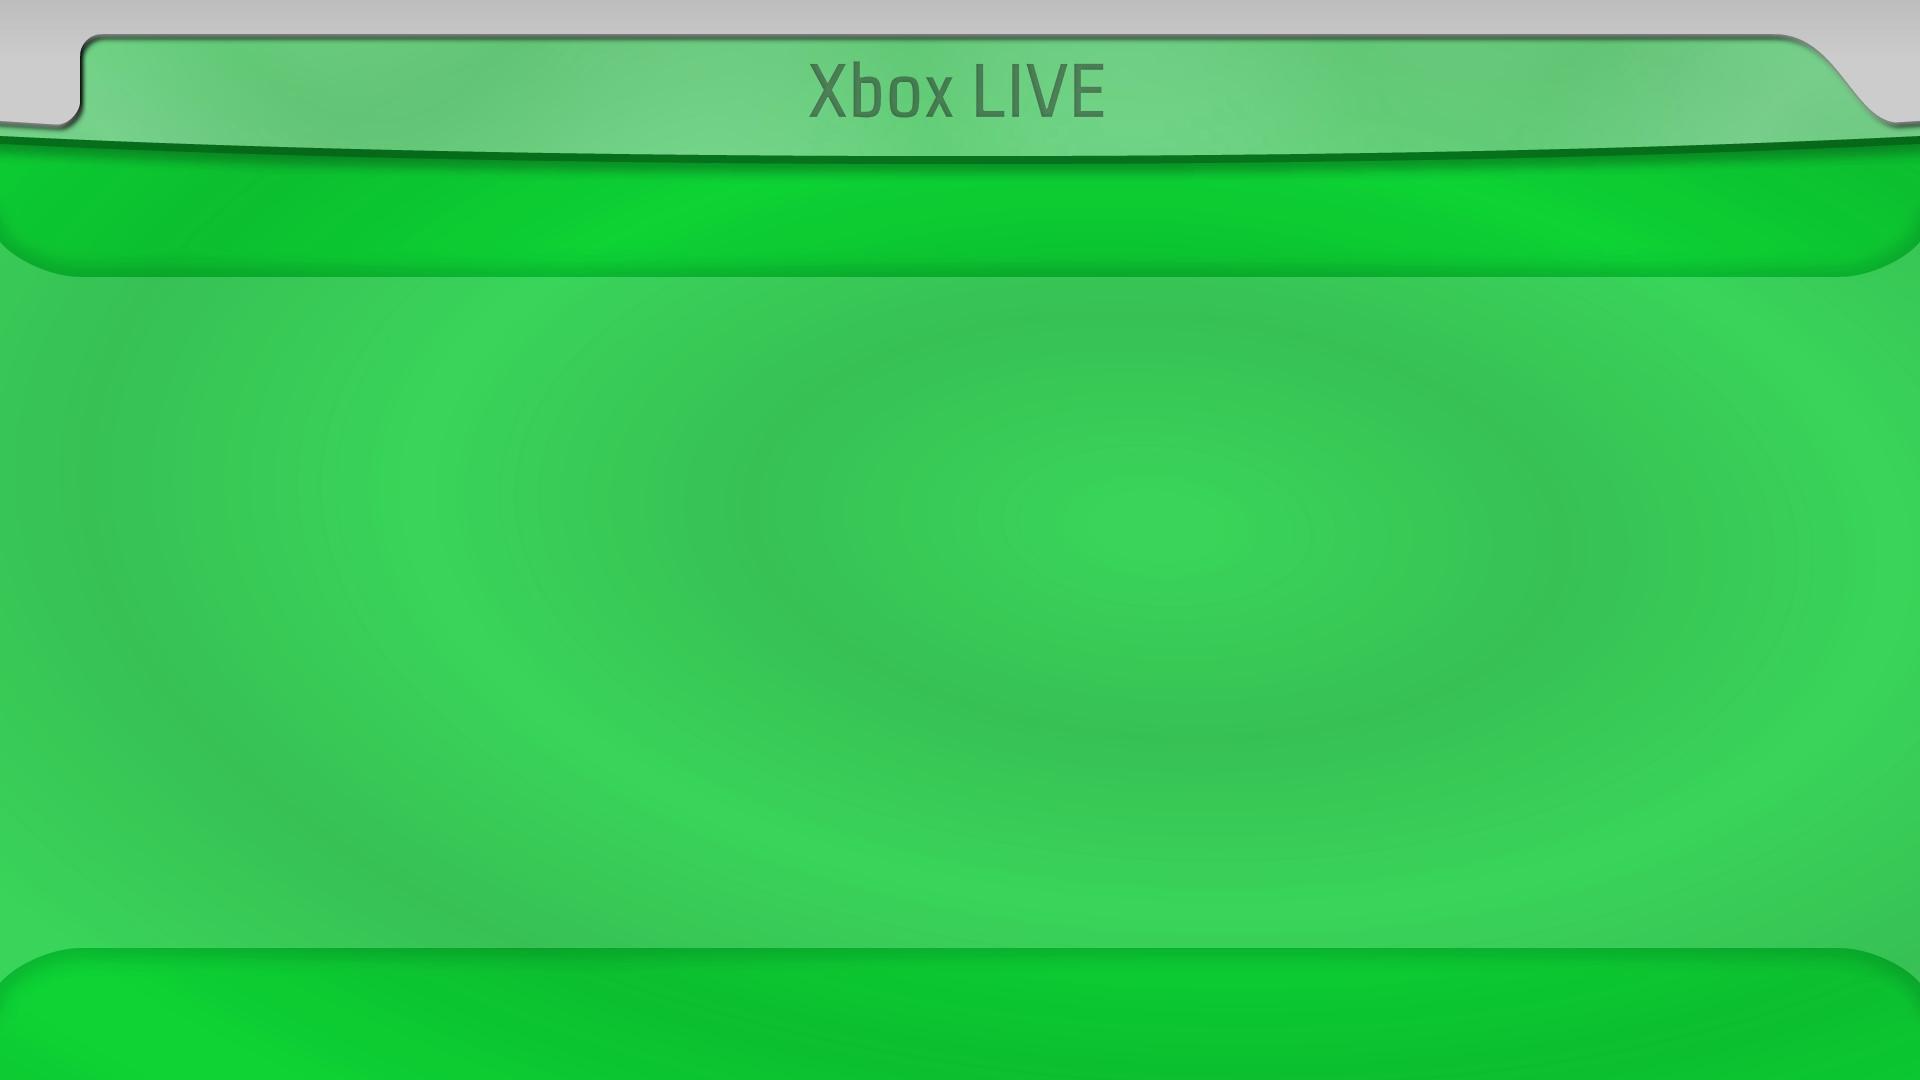 Classic Xbox Blades - Hintergrundbild